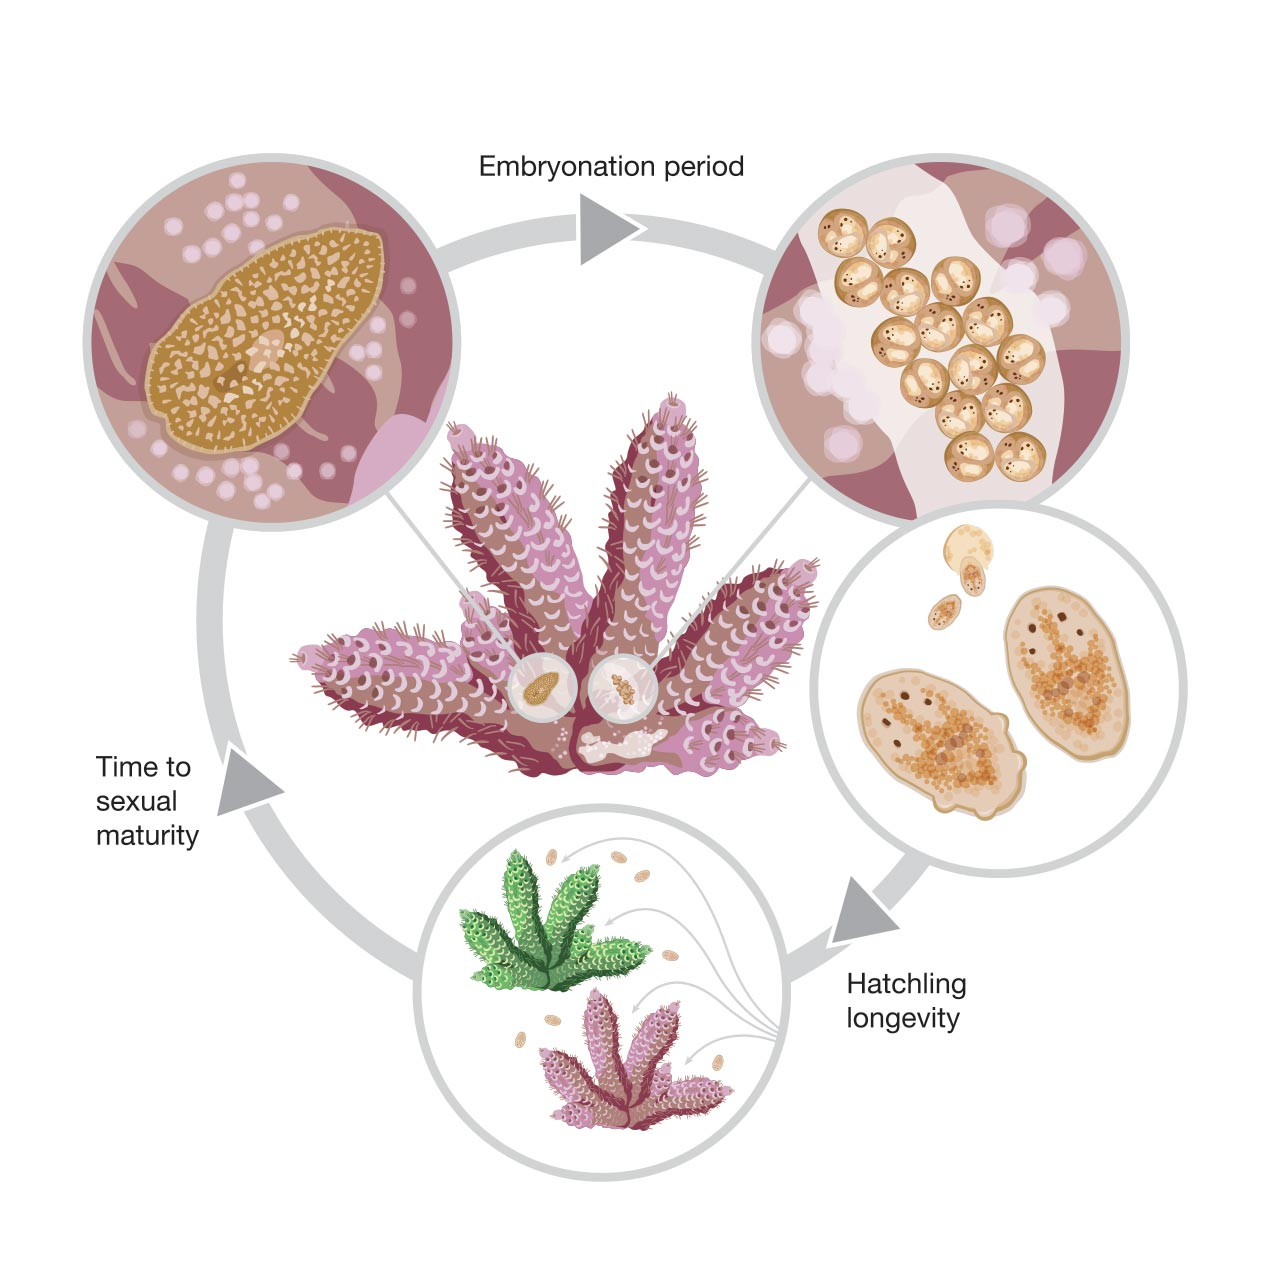 Polyclad flatworm life cycle